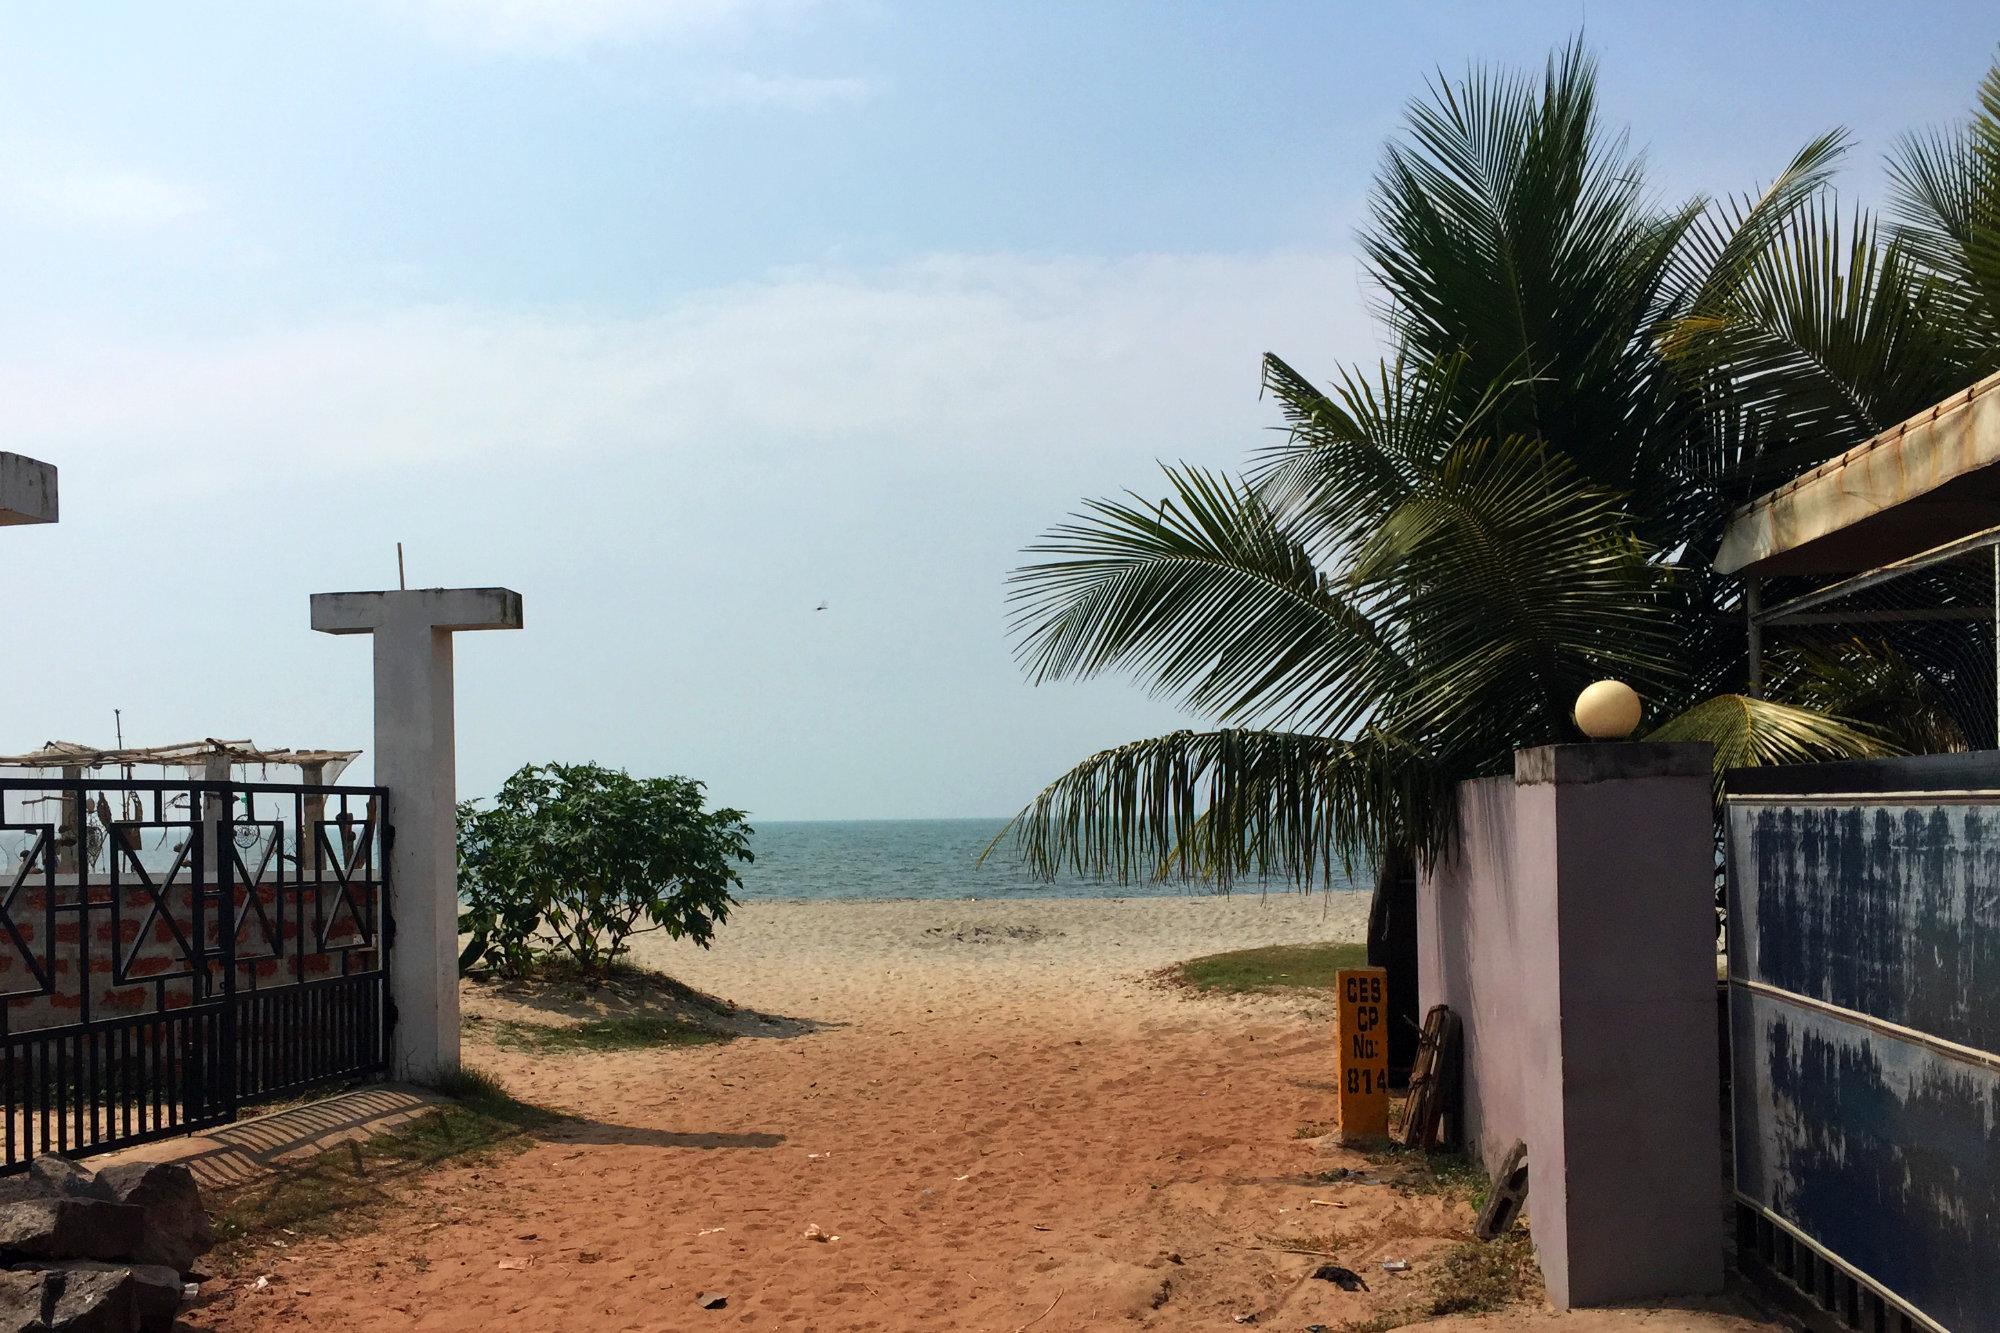 Indien Hotels Alleppey Strandzugang